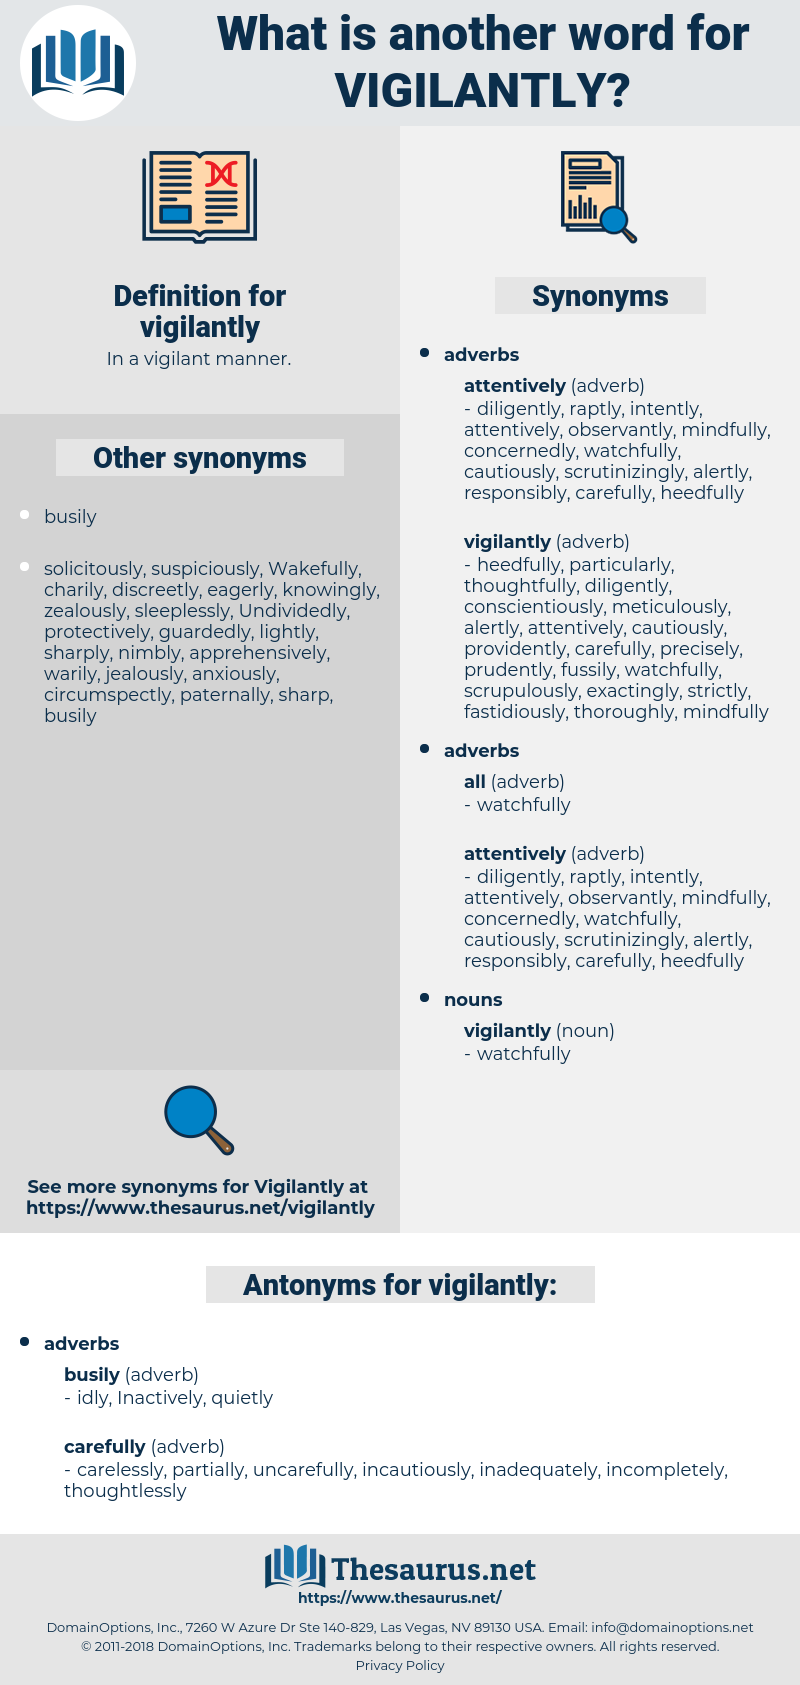 vigilantly, synonym vigilantly, another word for vigilantly, words like vigilantly, thesaurus vigilantly